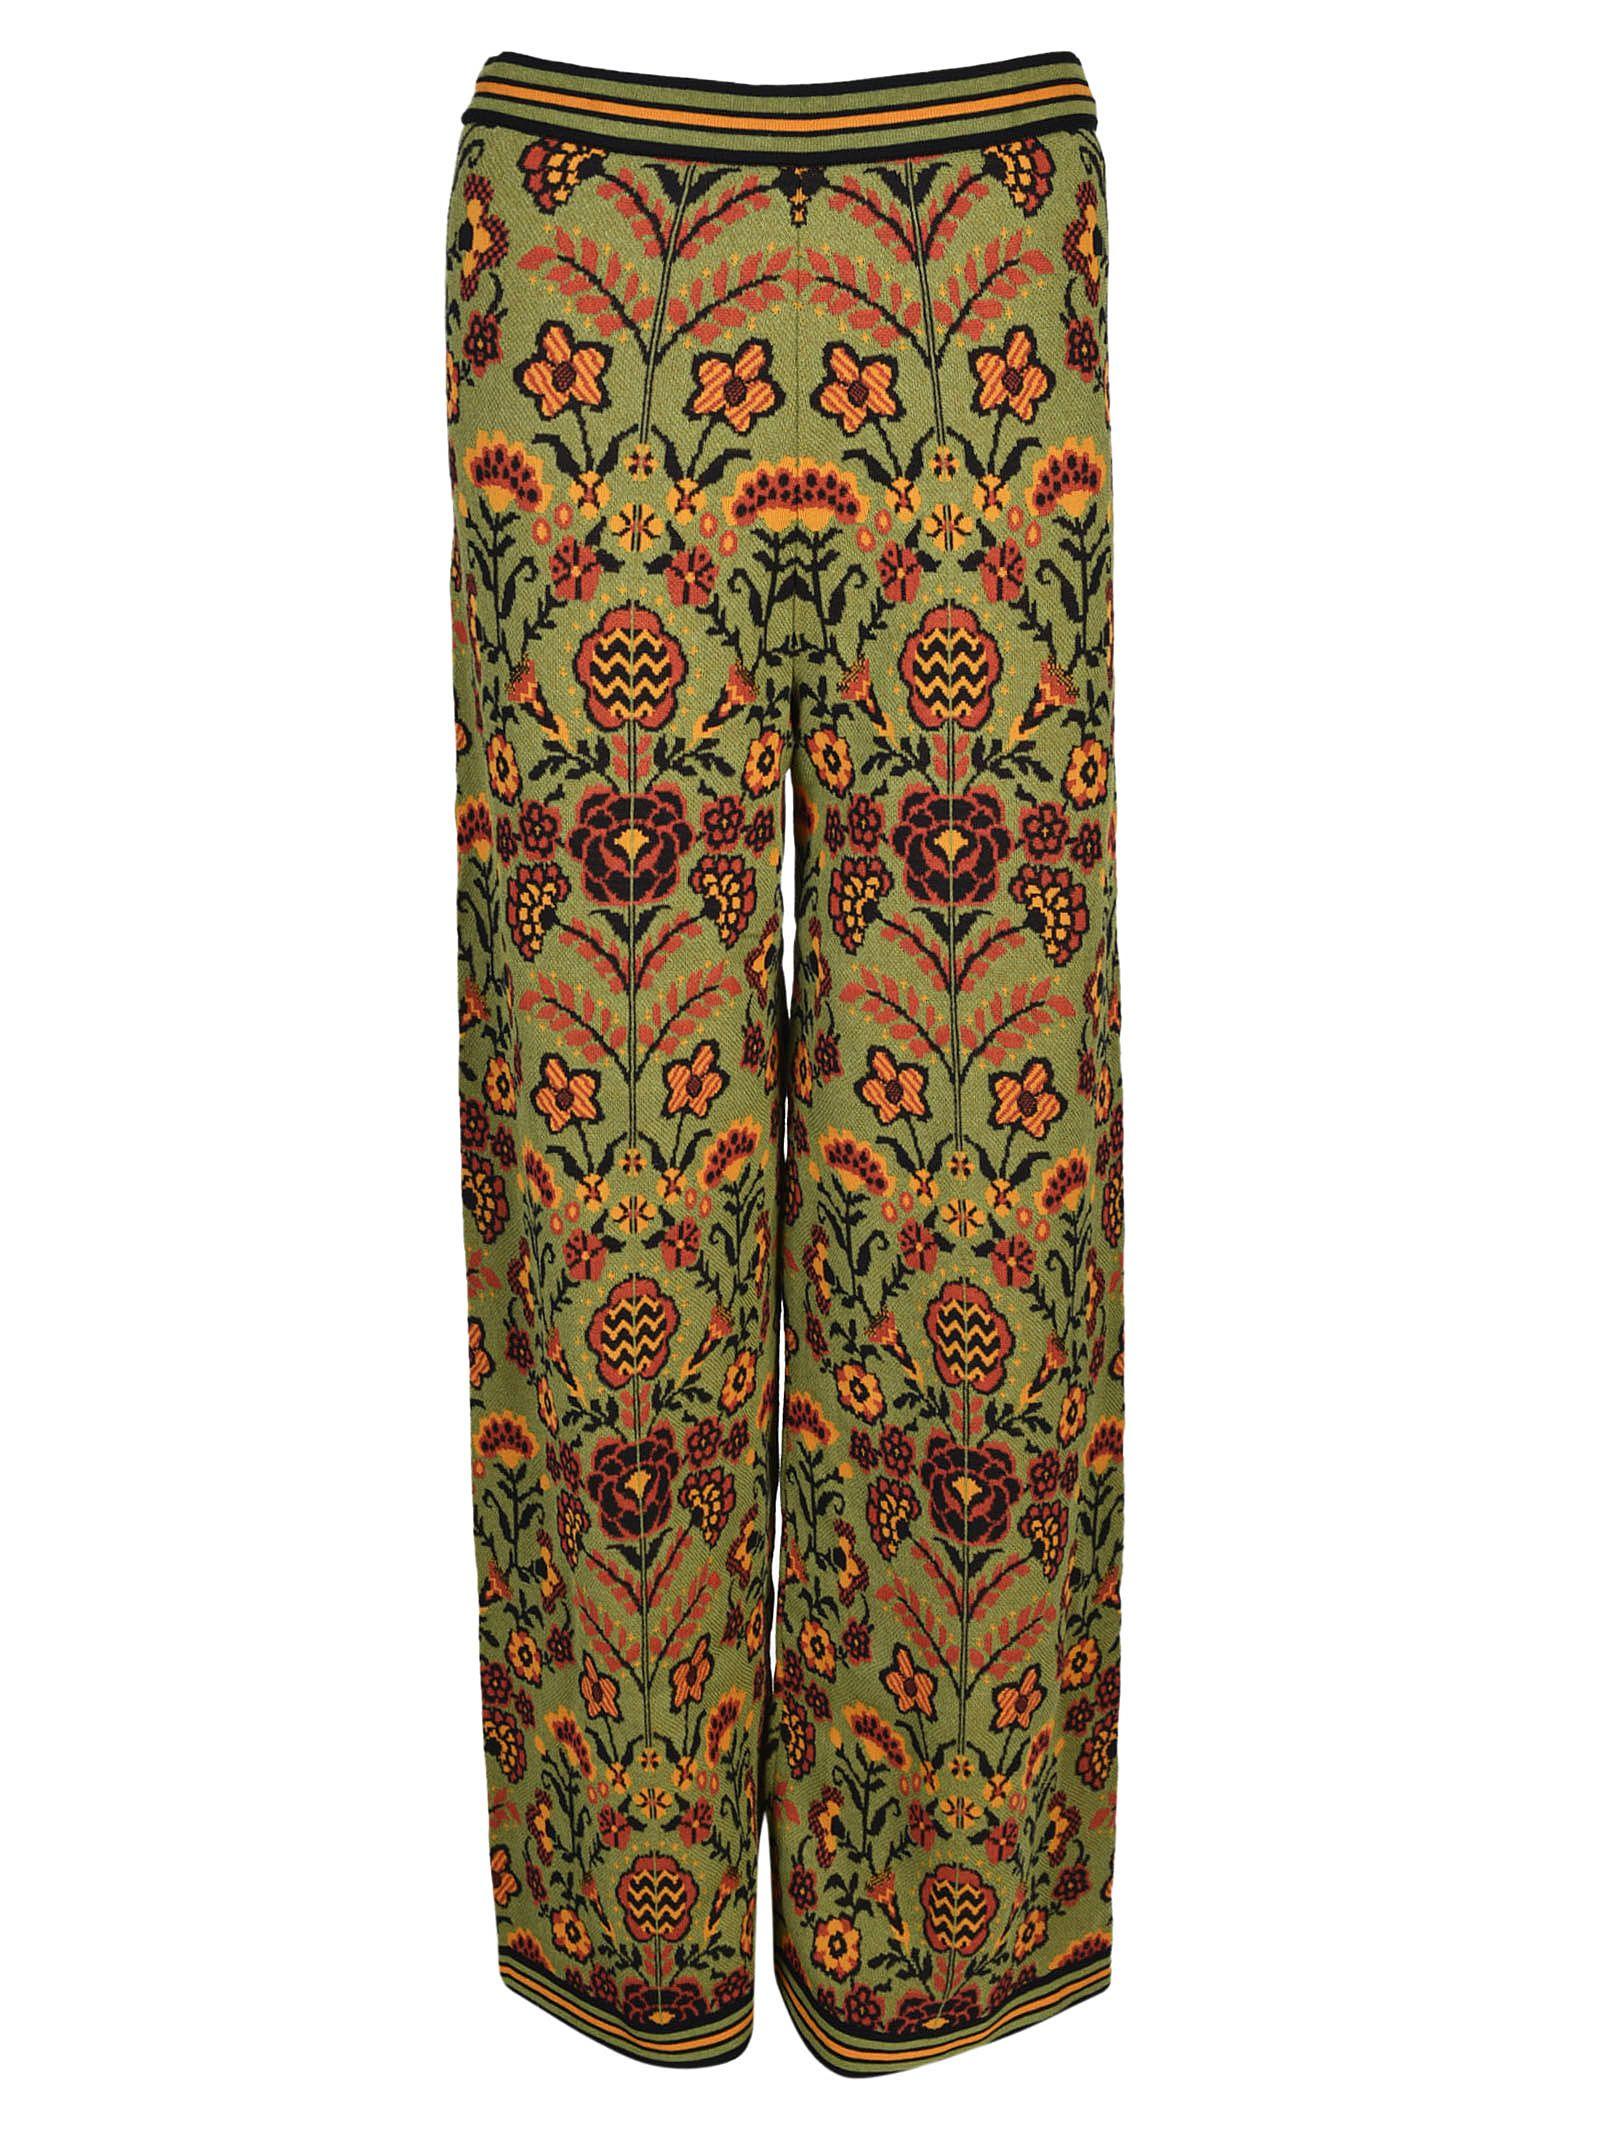 M Missoni Floral Print Trousers